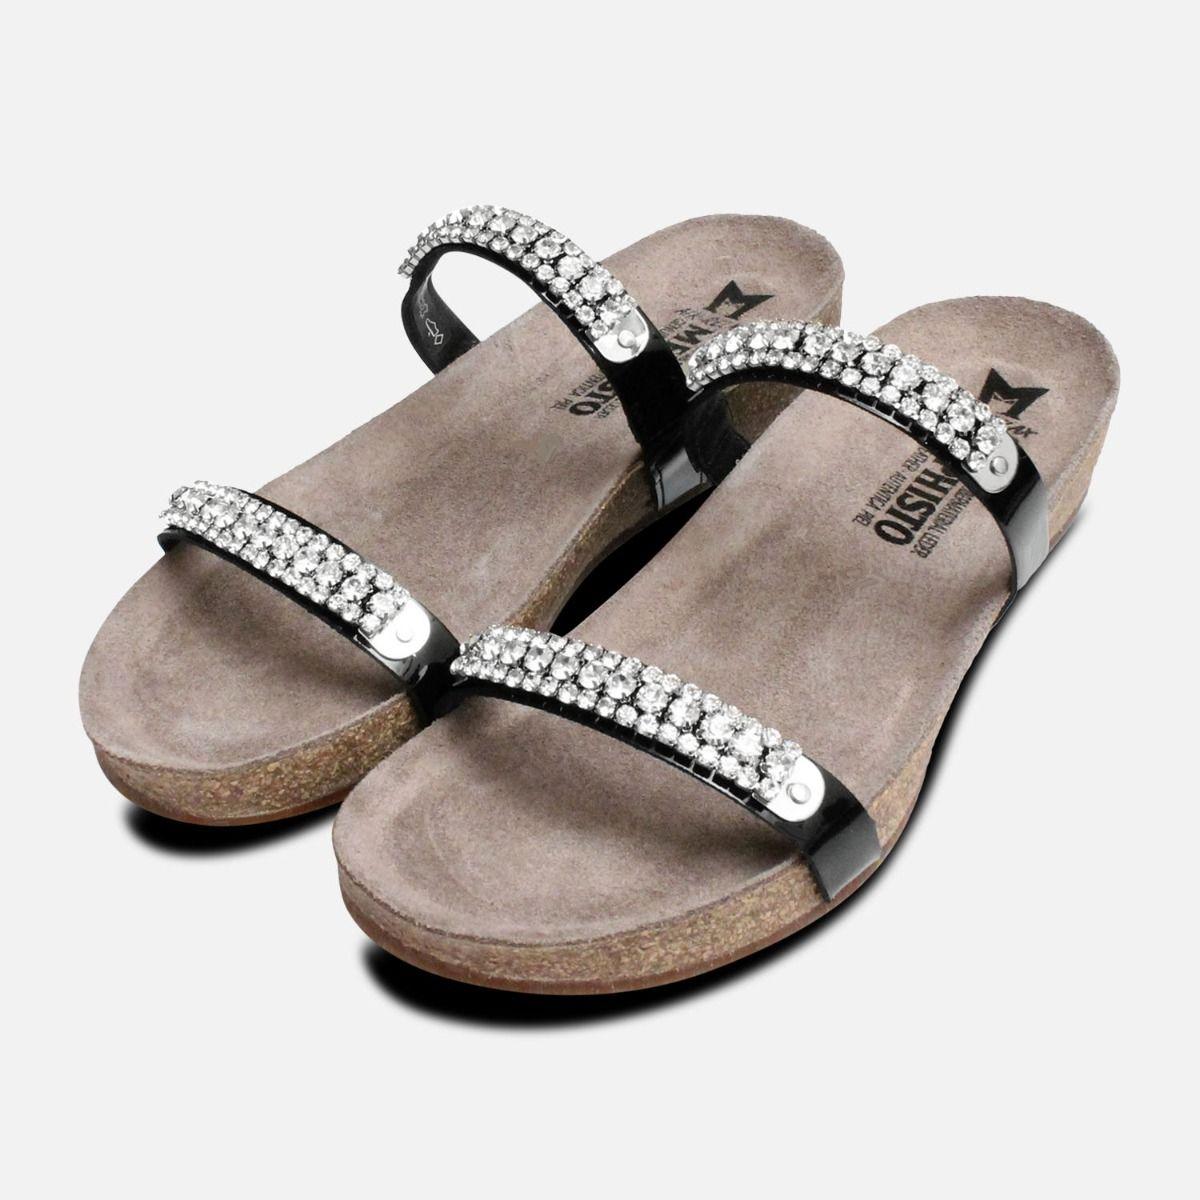 c89c07bee344 Crystal Ivana Black Patent Mephisto Sandals